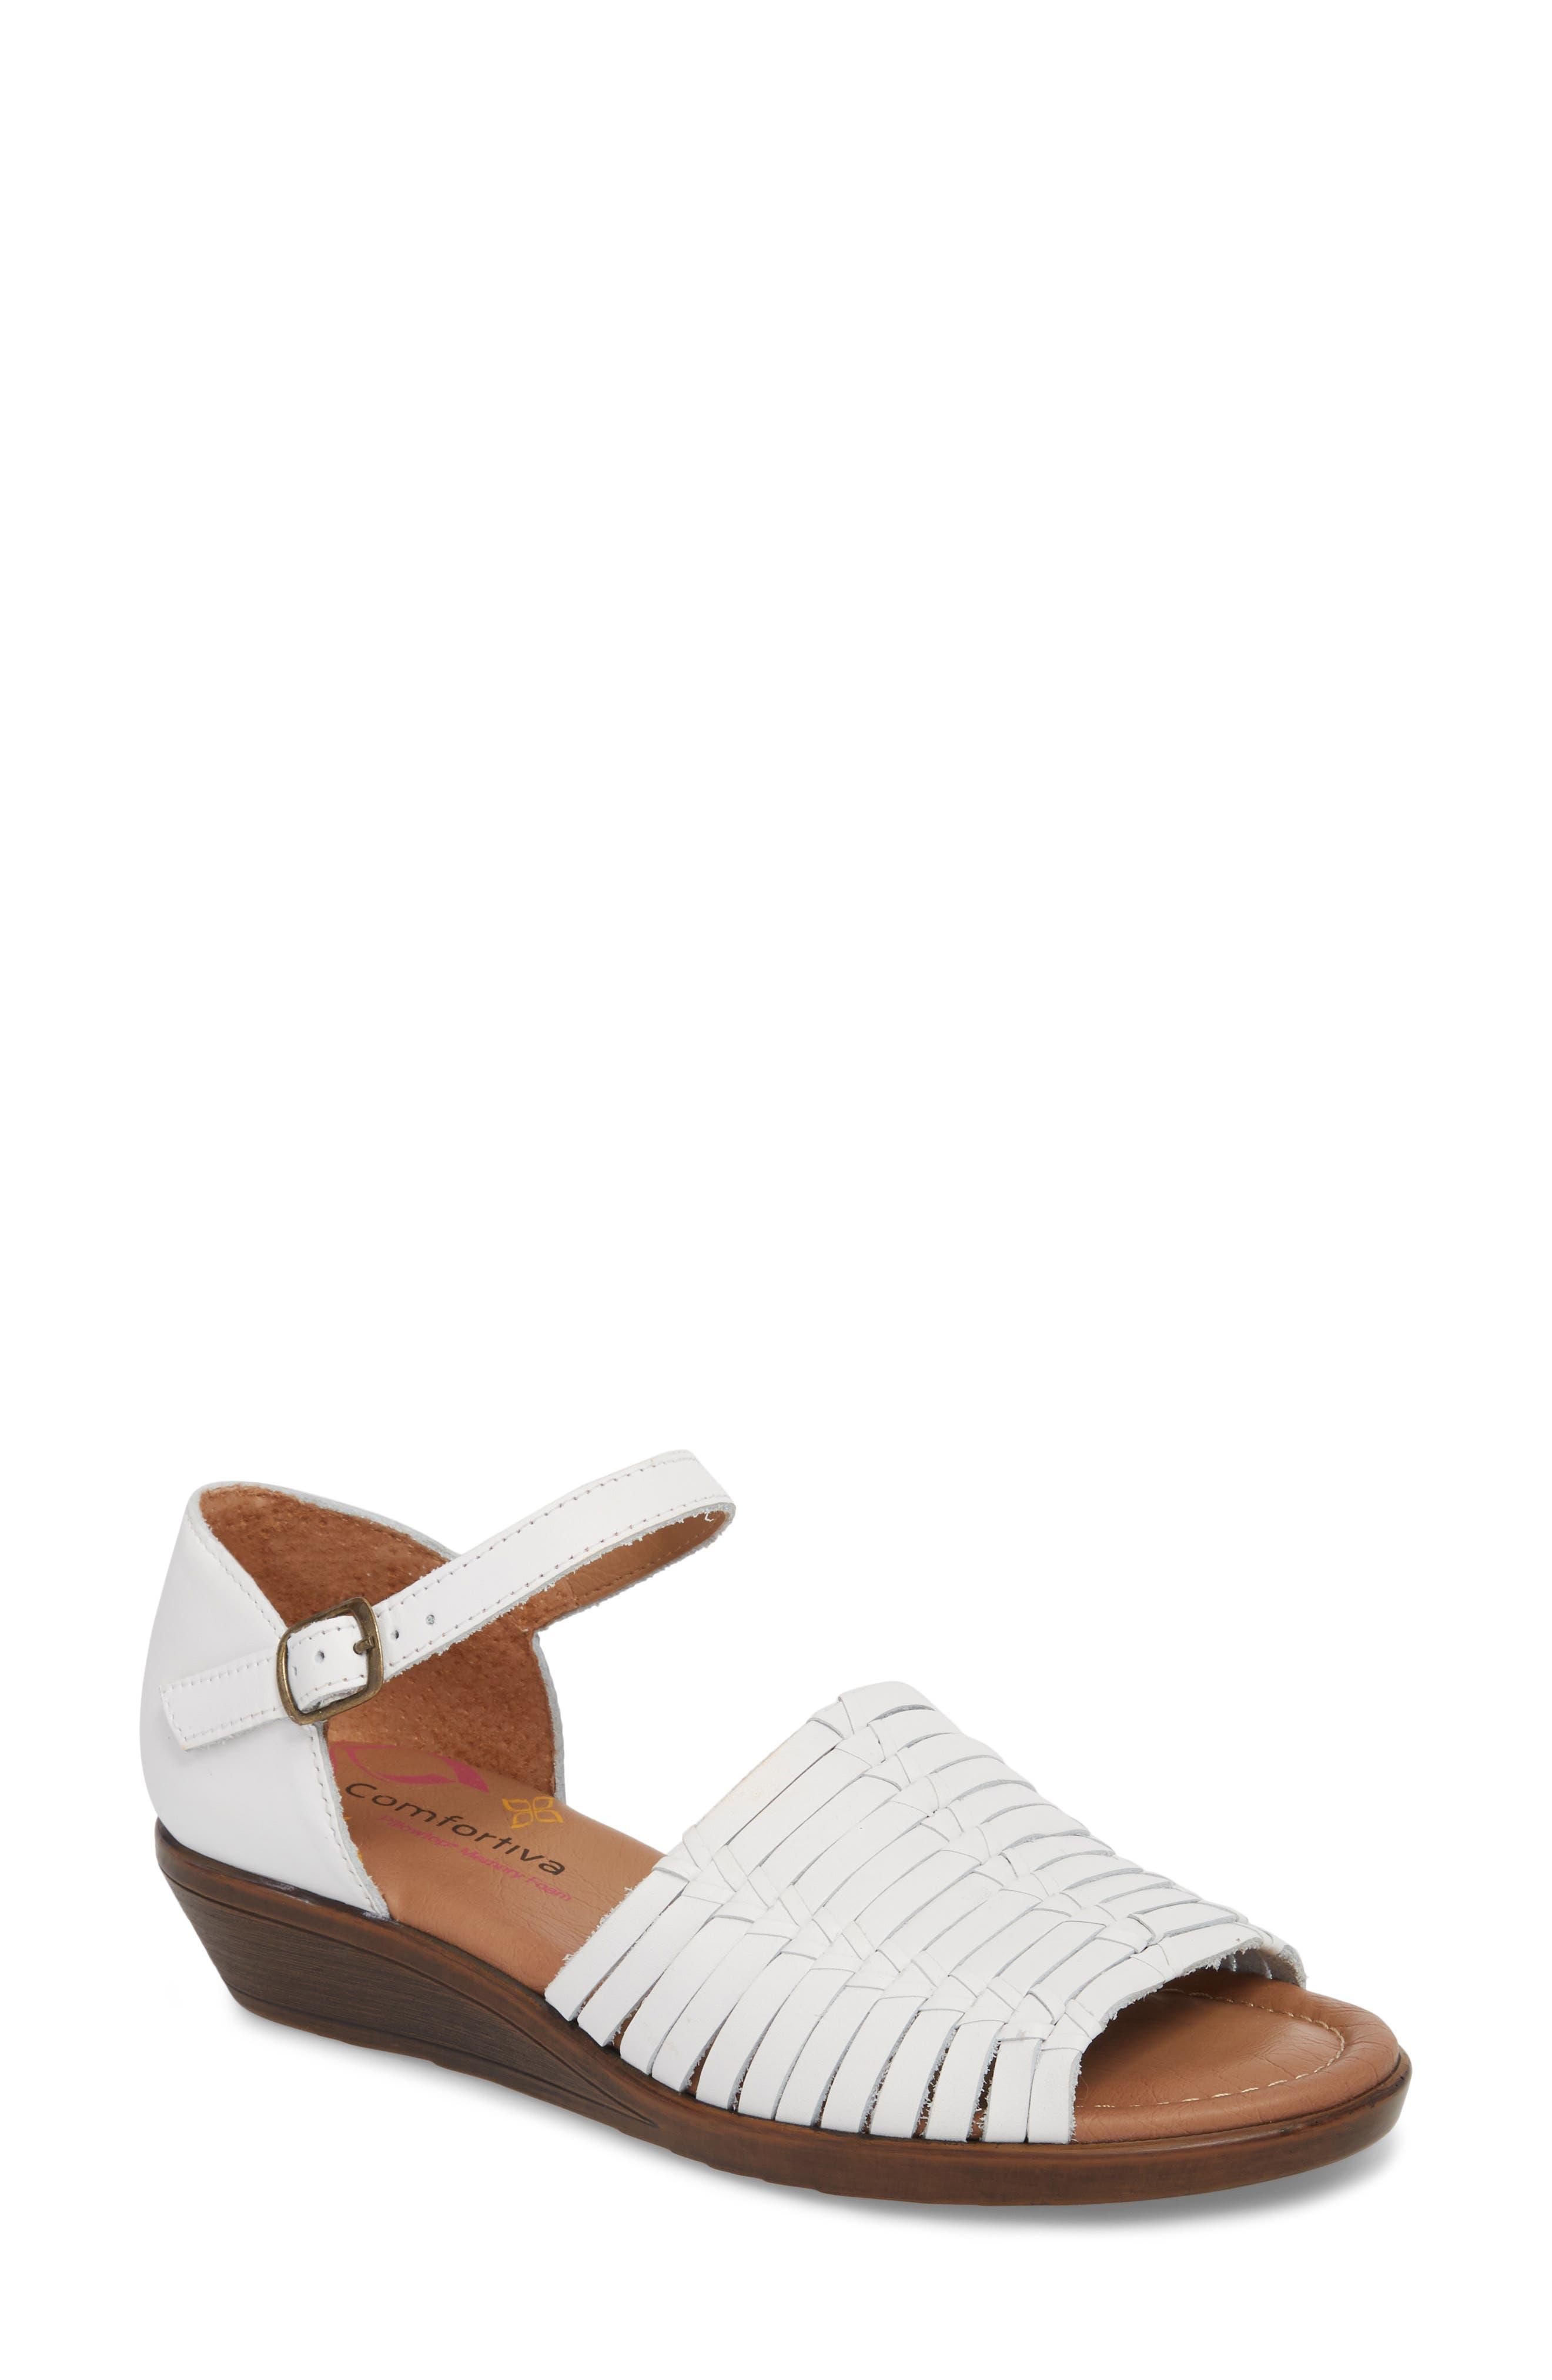 Fayann Sandal,                         Main,                         color, White Leather